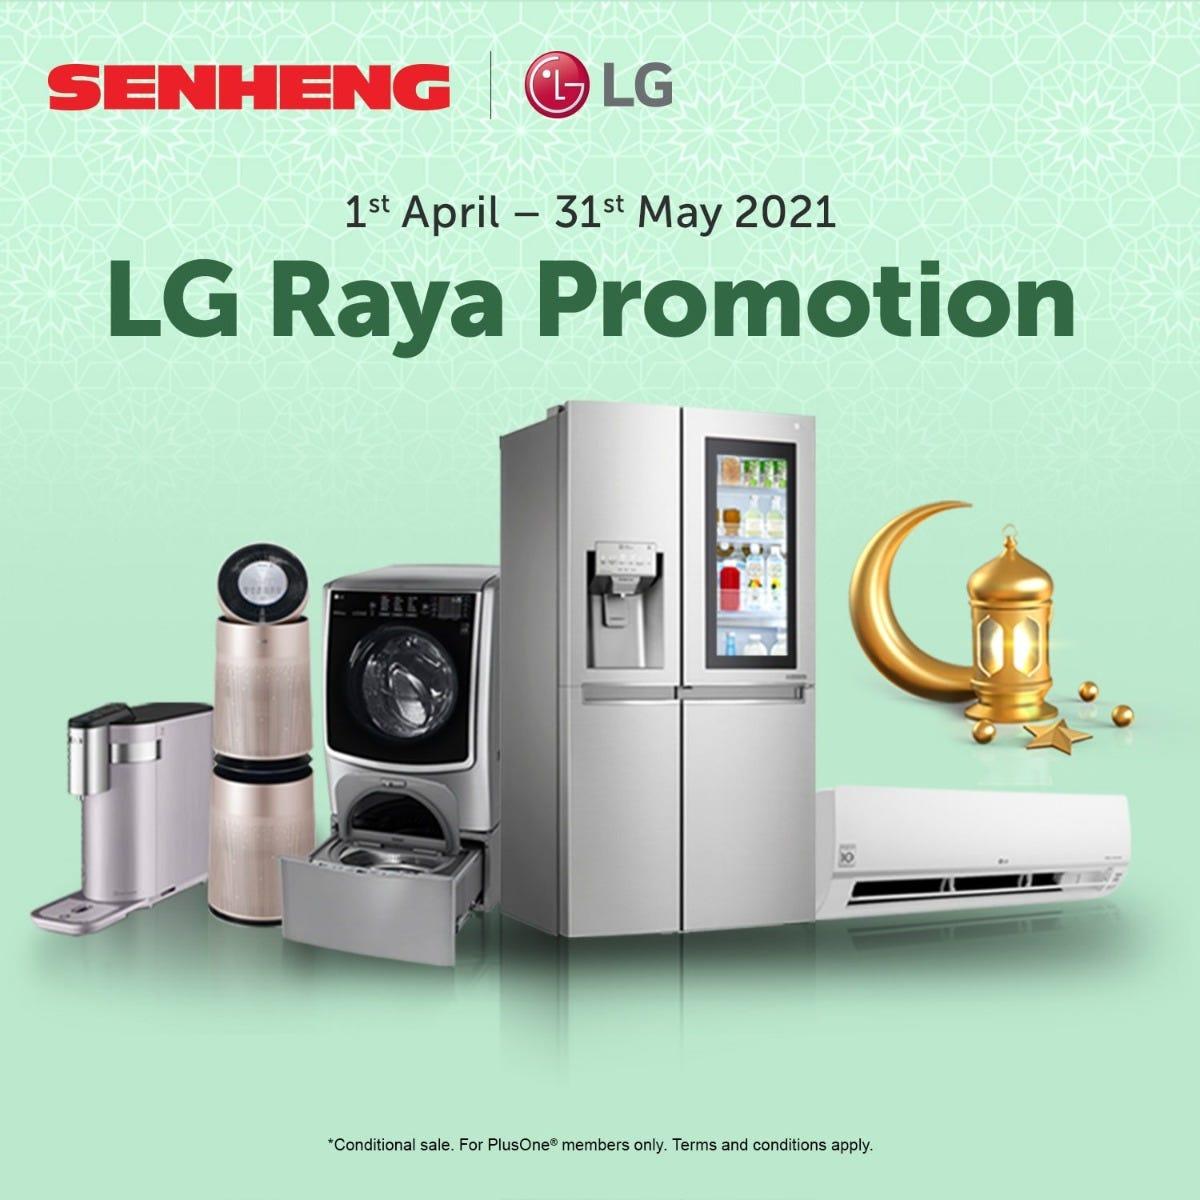 LG Raya Promotion